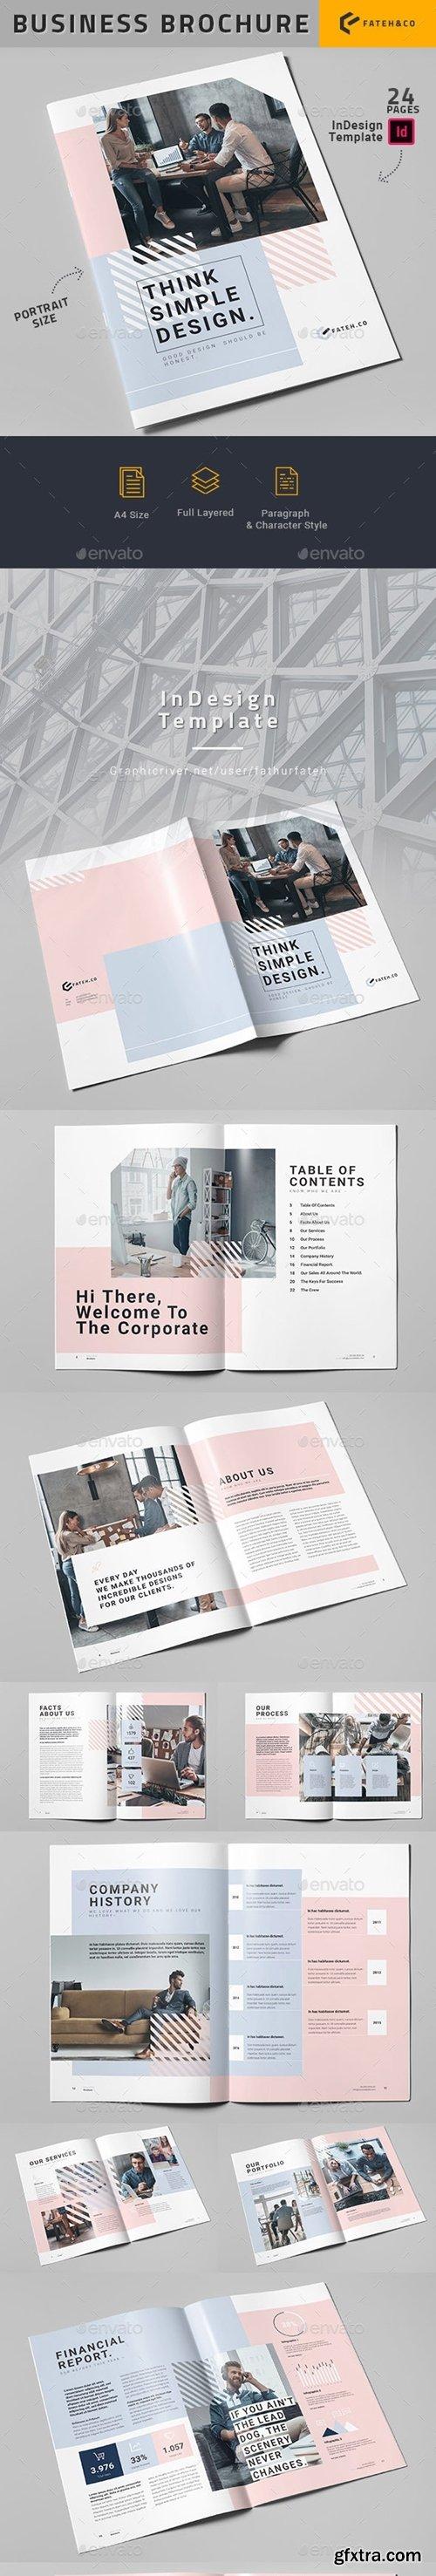 GraphicRiver - Business Brochure Vol.4 25591806